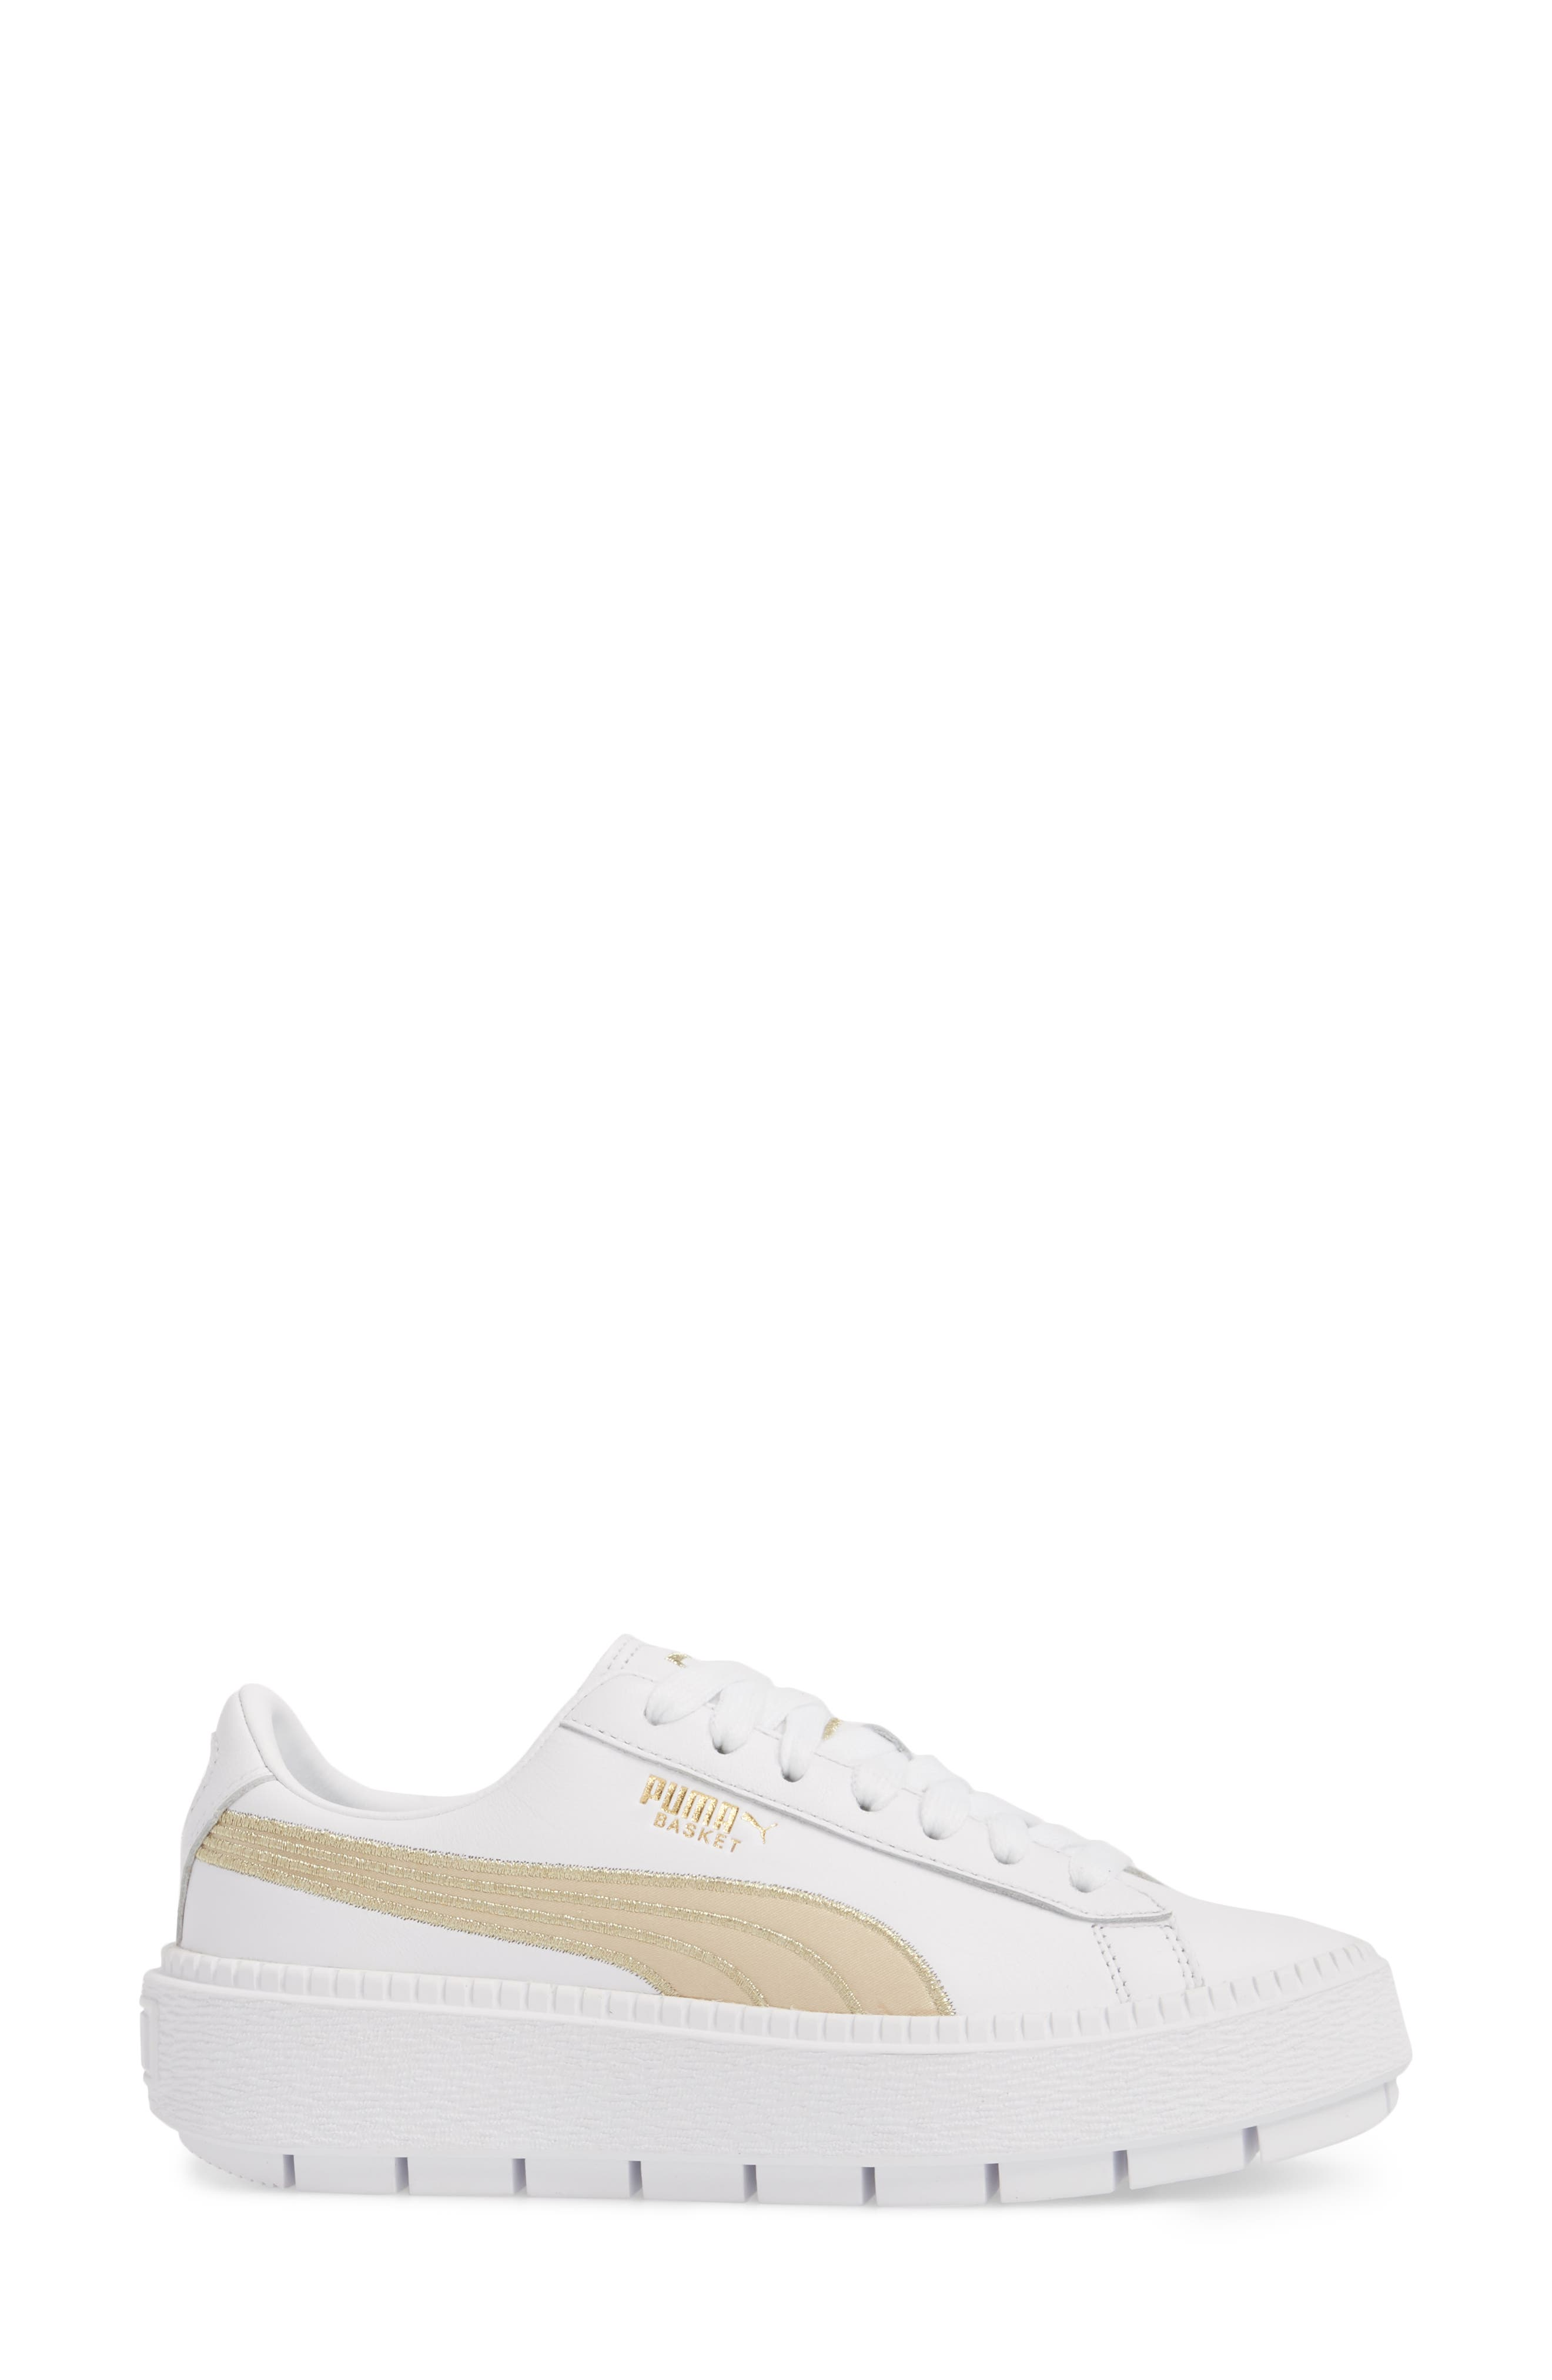 Platform Trace Sneaker,                             Alternate thumbnail 6, color,                             Puma White/ Metallic Gold